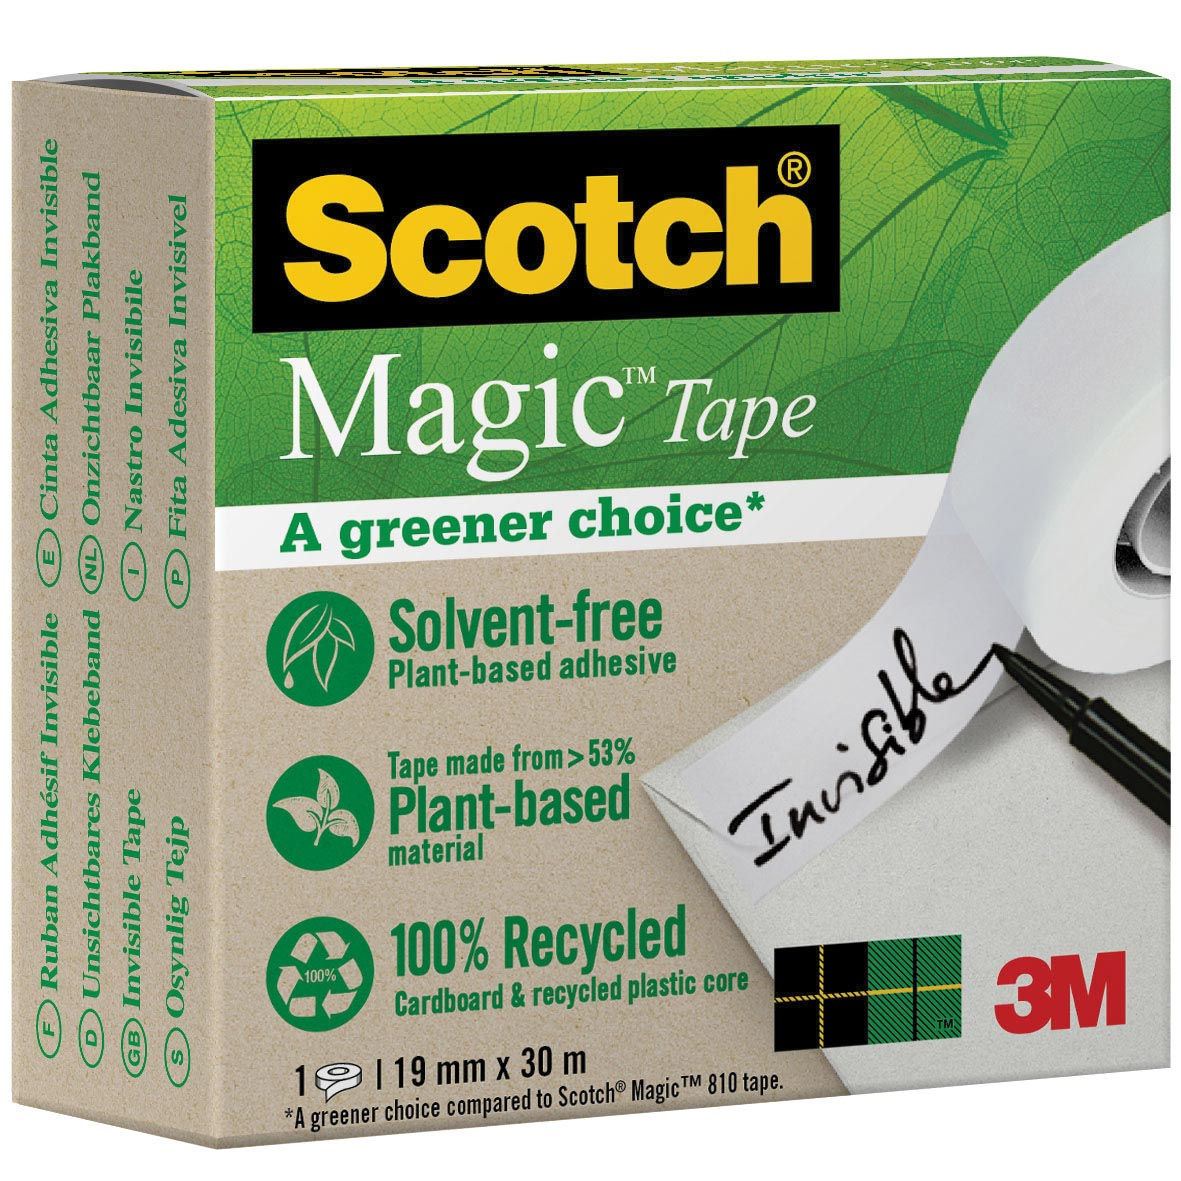 Plakband Magic Tape A greener choice ft 19 mm x 30 m, doos met 1 rolletje